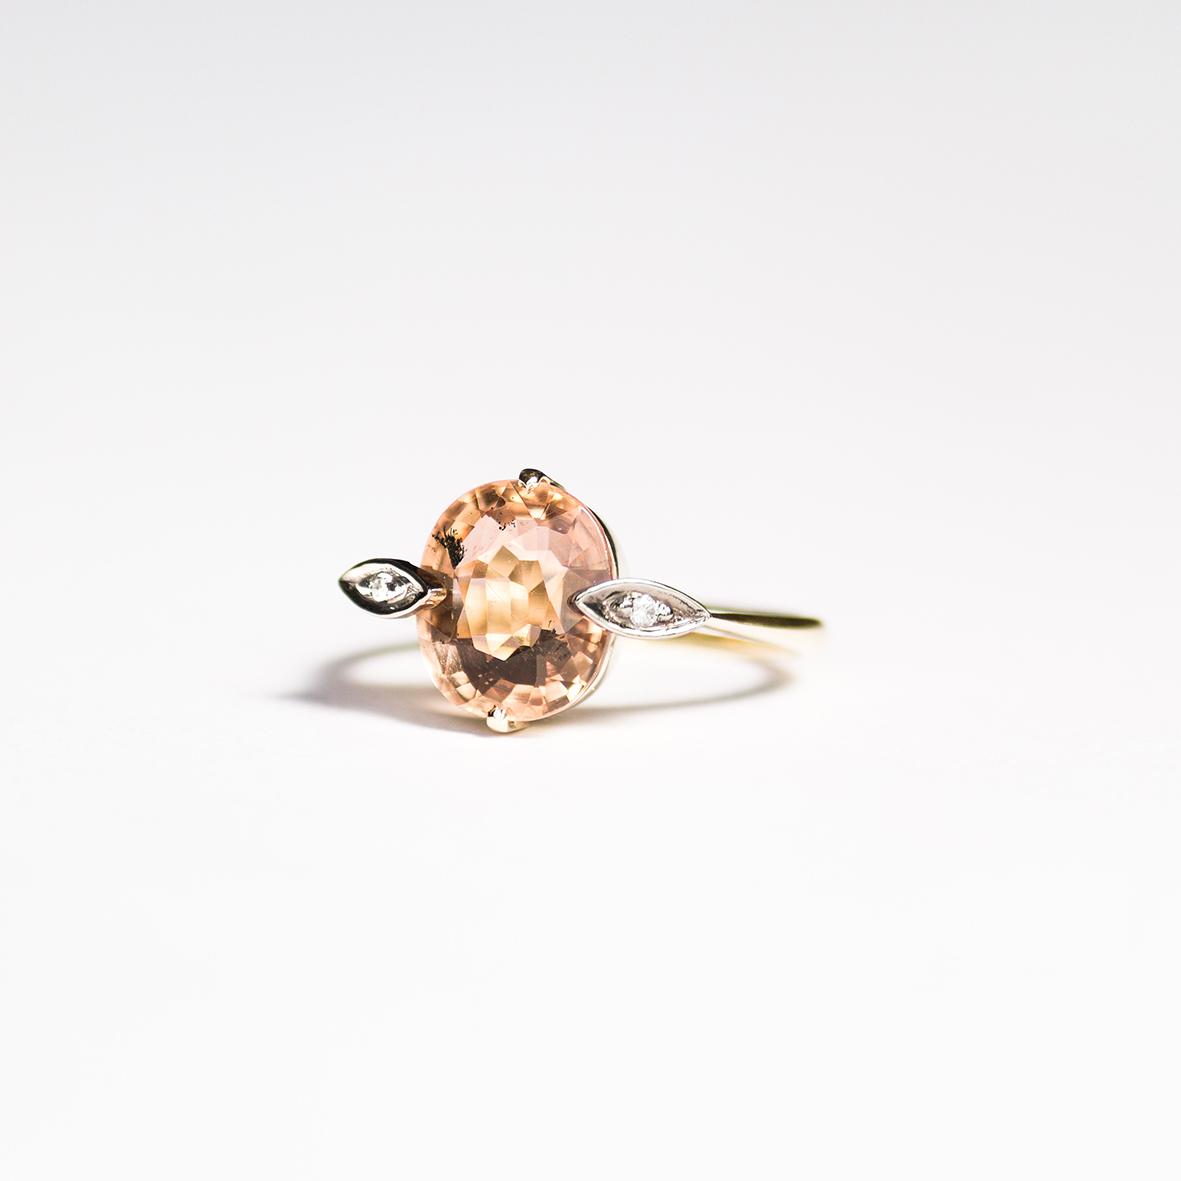 1. OONA_engagement_ficha2_peach tourmaline ring